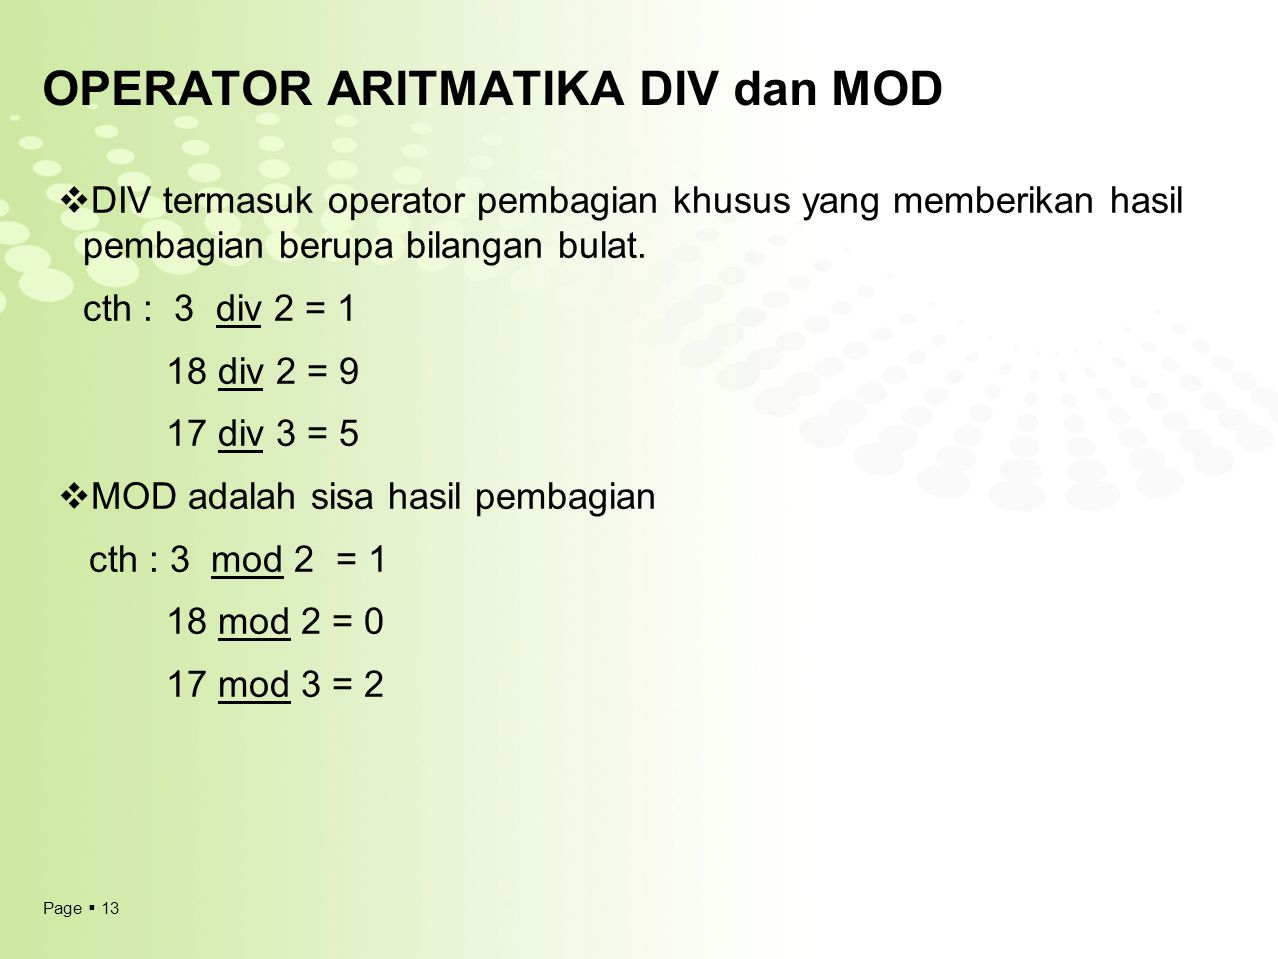 OPERATOR ARITMATIKA DIV dan MOD